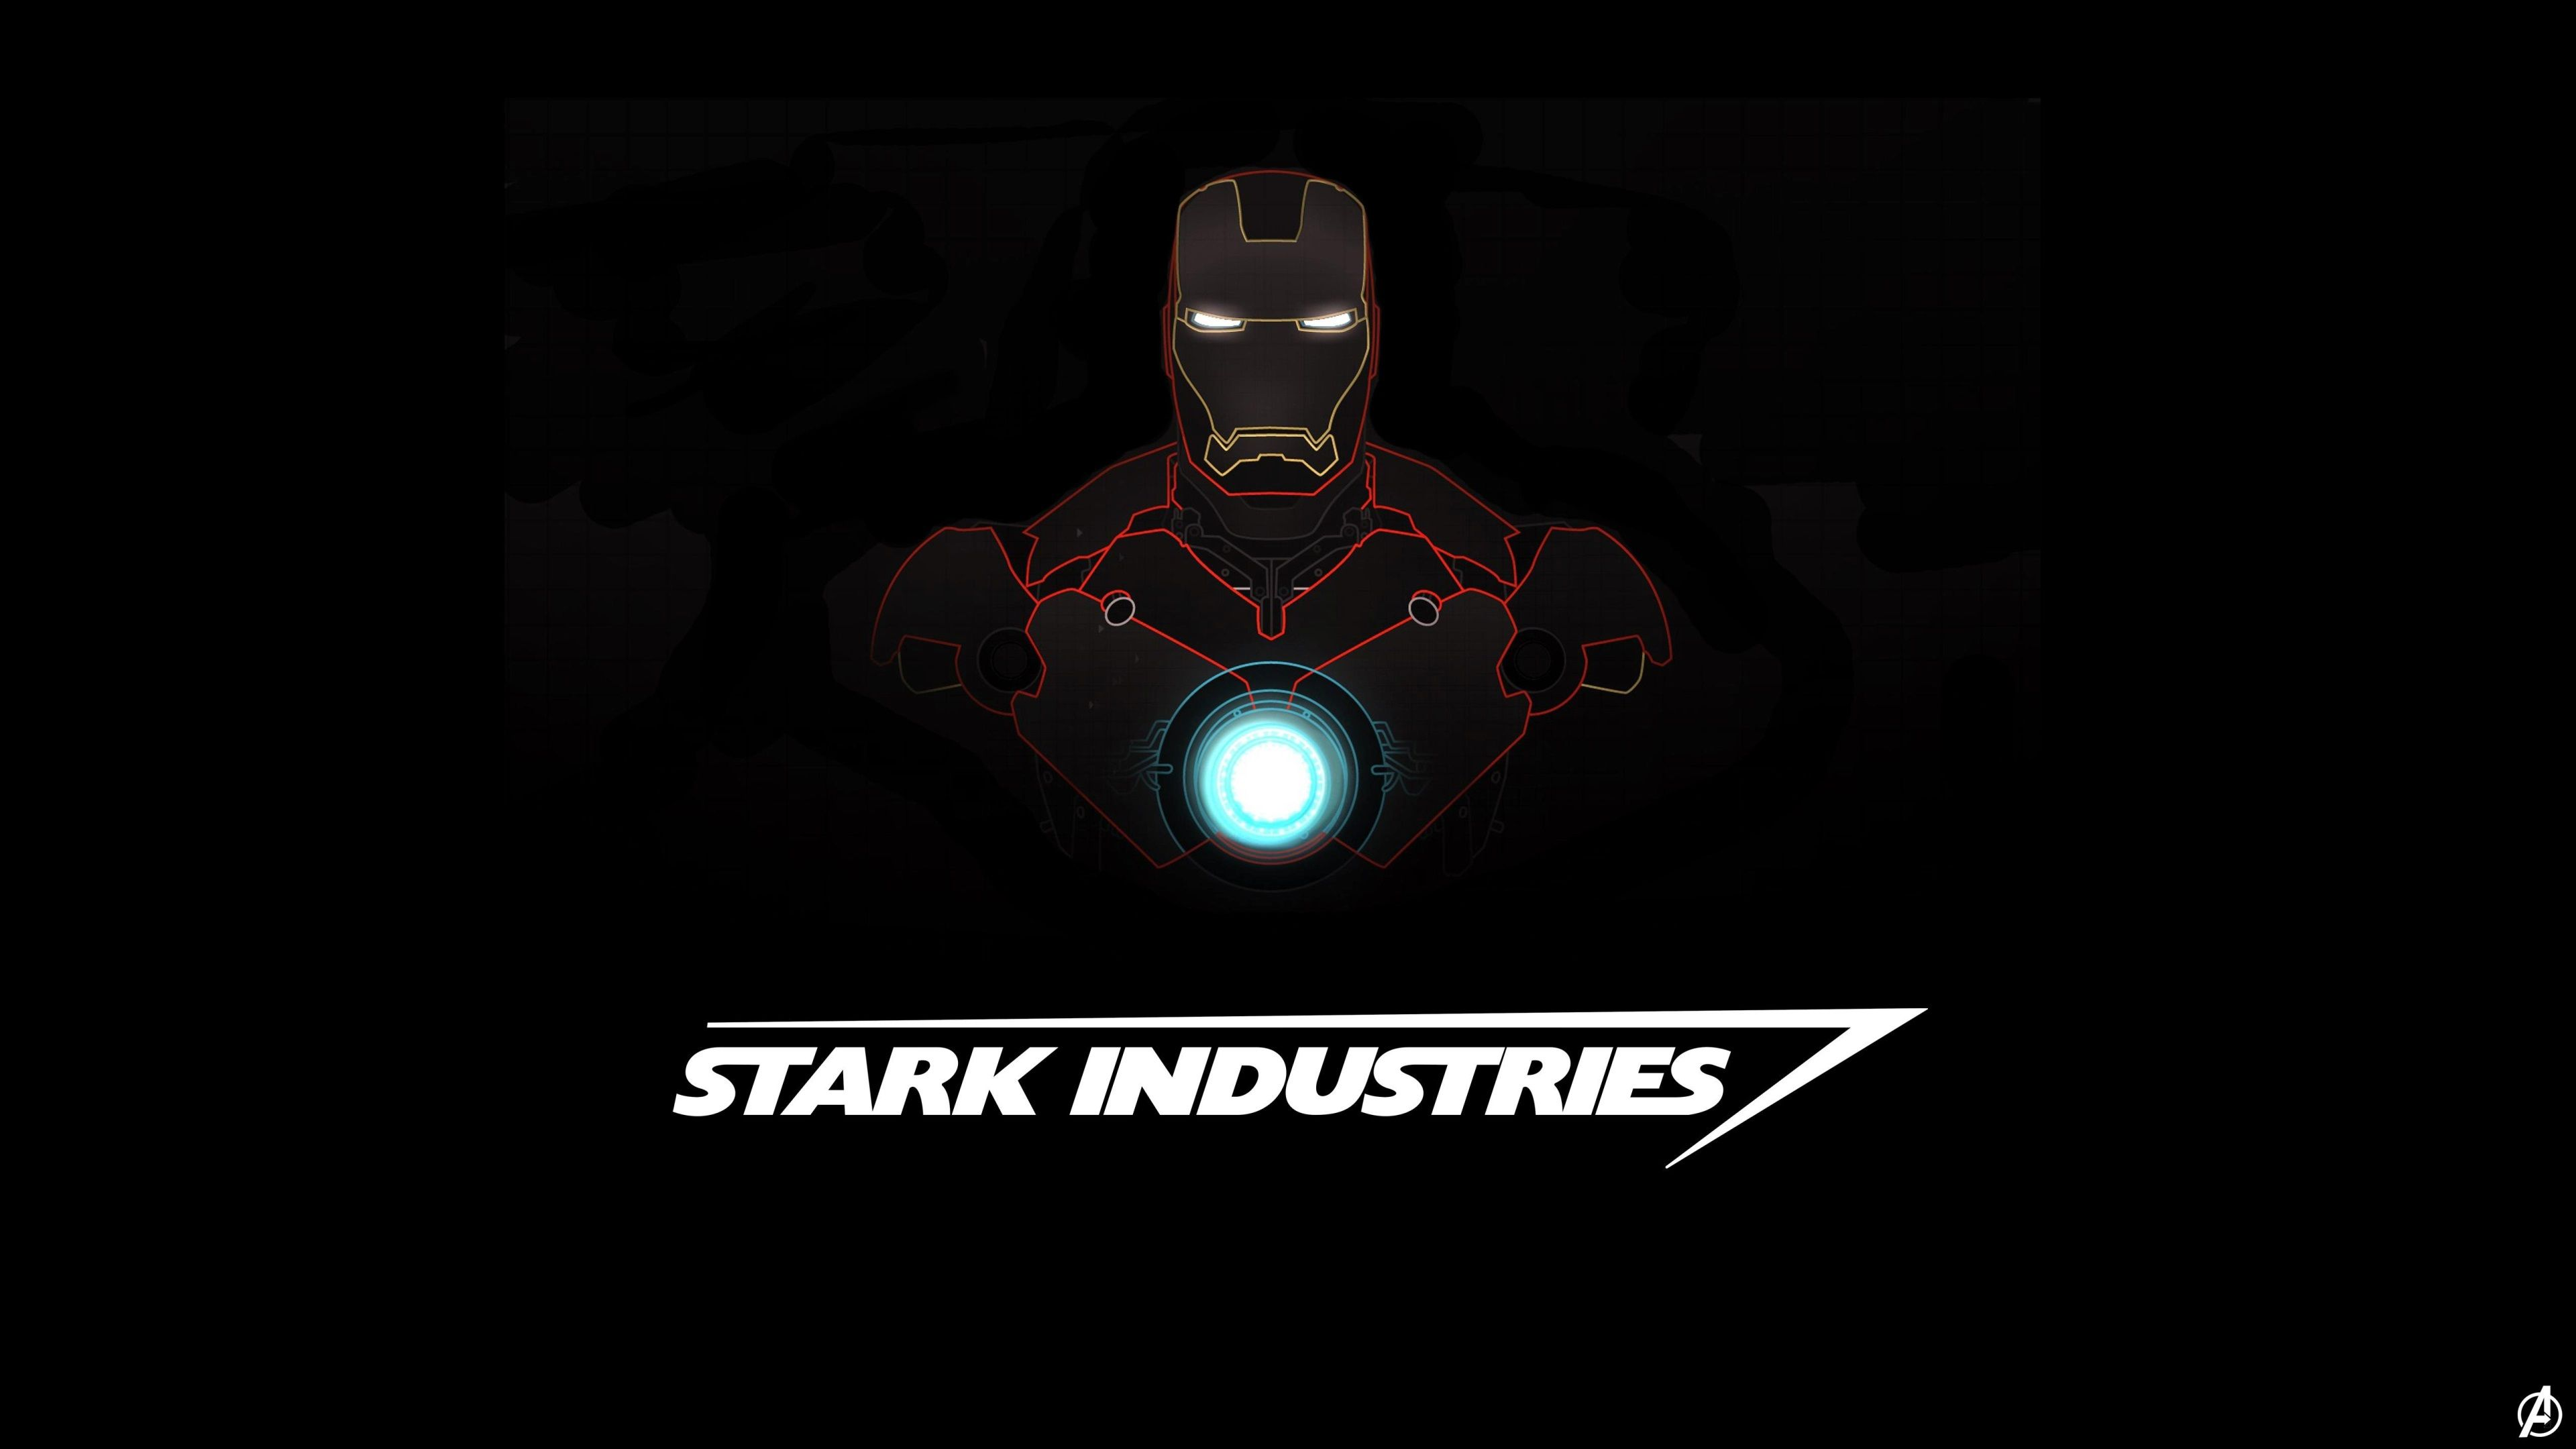 3840x2160 Iron Man 4k Screen Wallpaper Iron Man Hd Wallpaper Iron Man Wallpaper Stark Industries